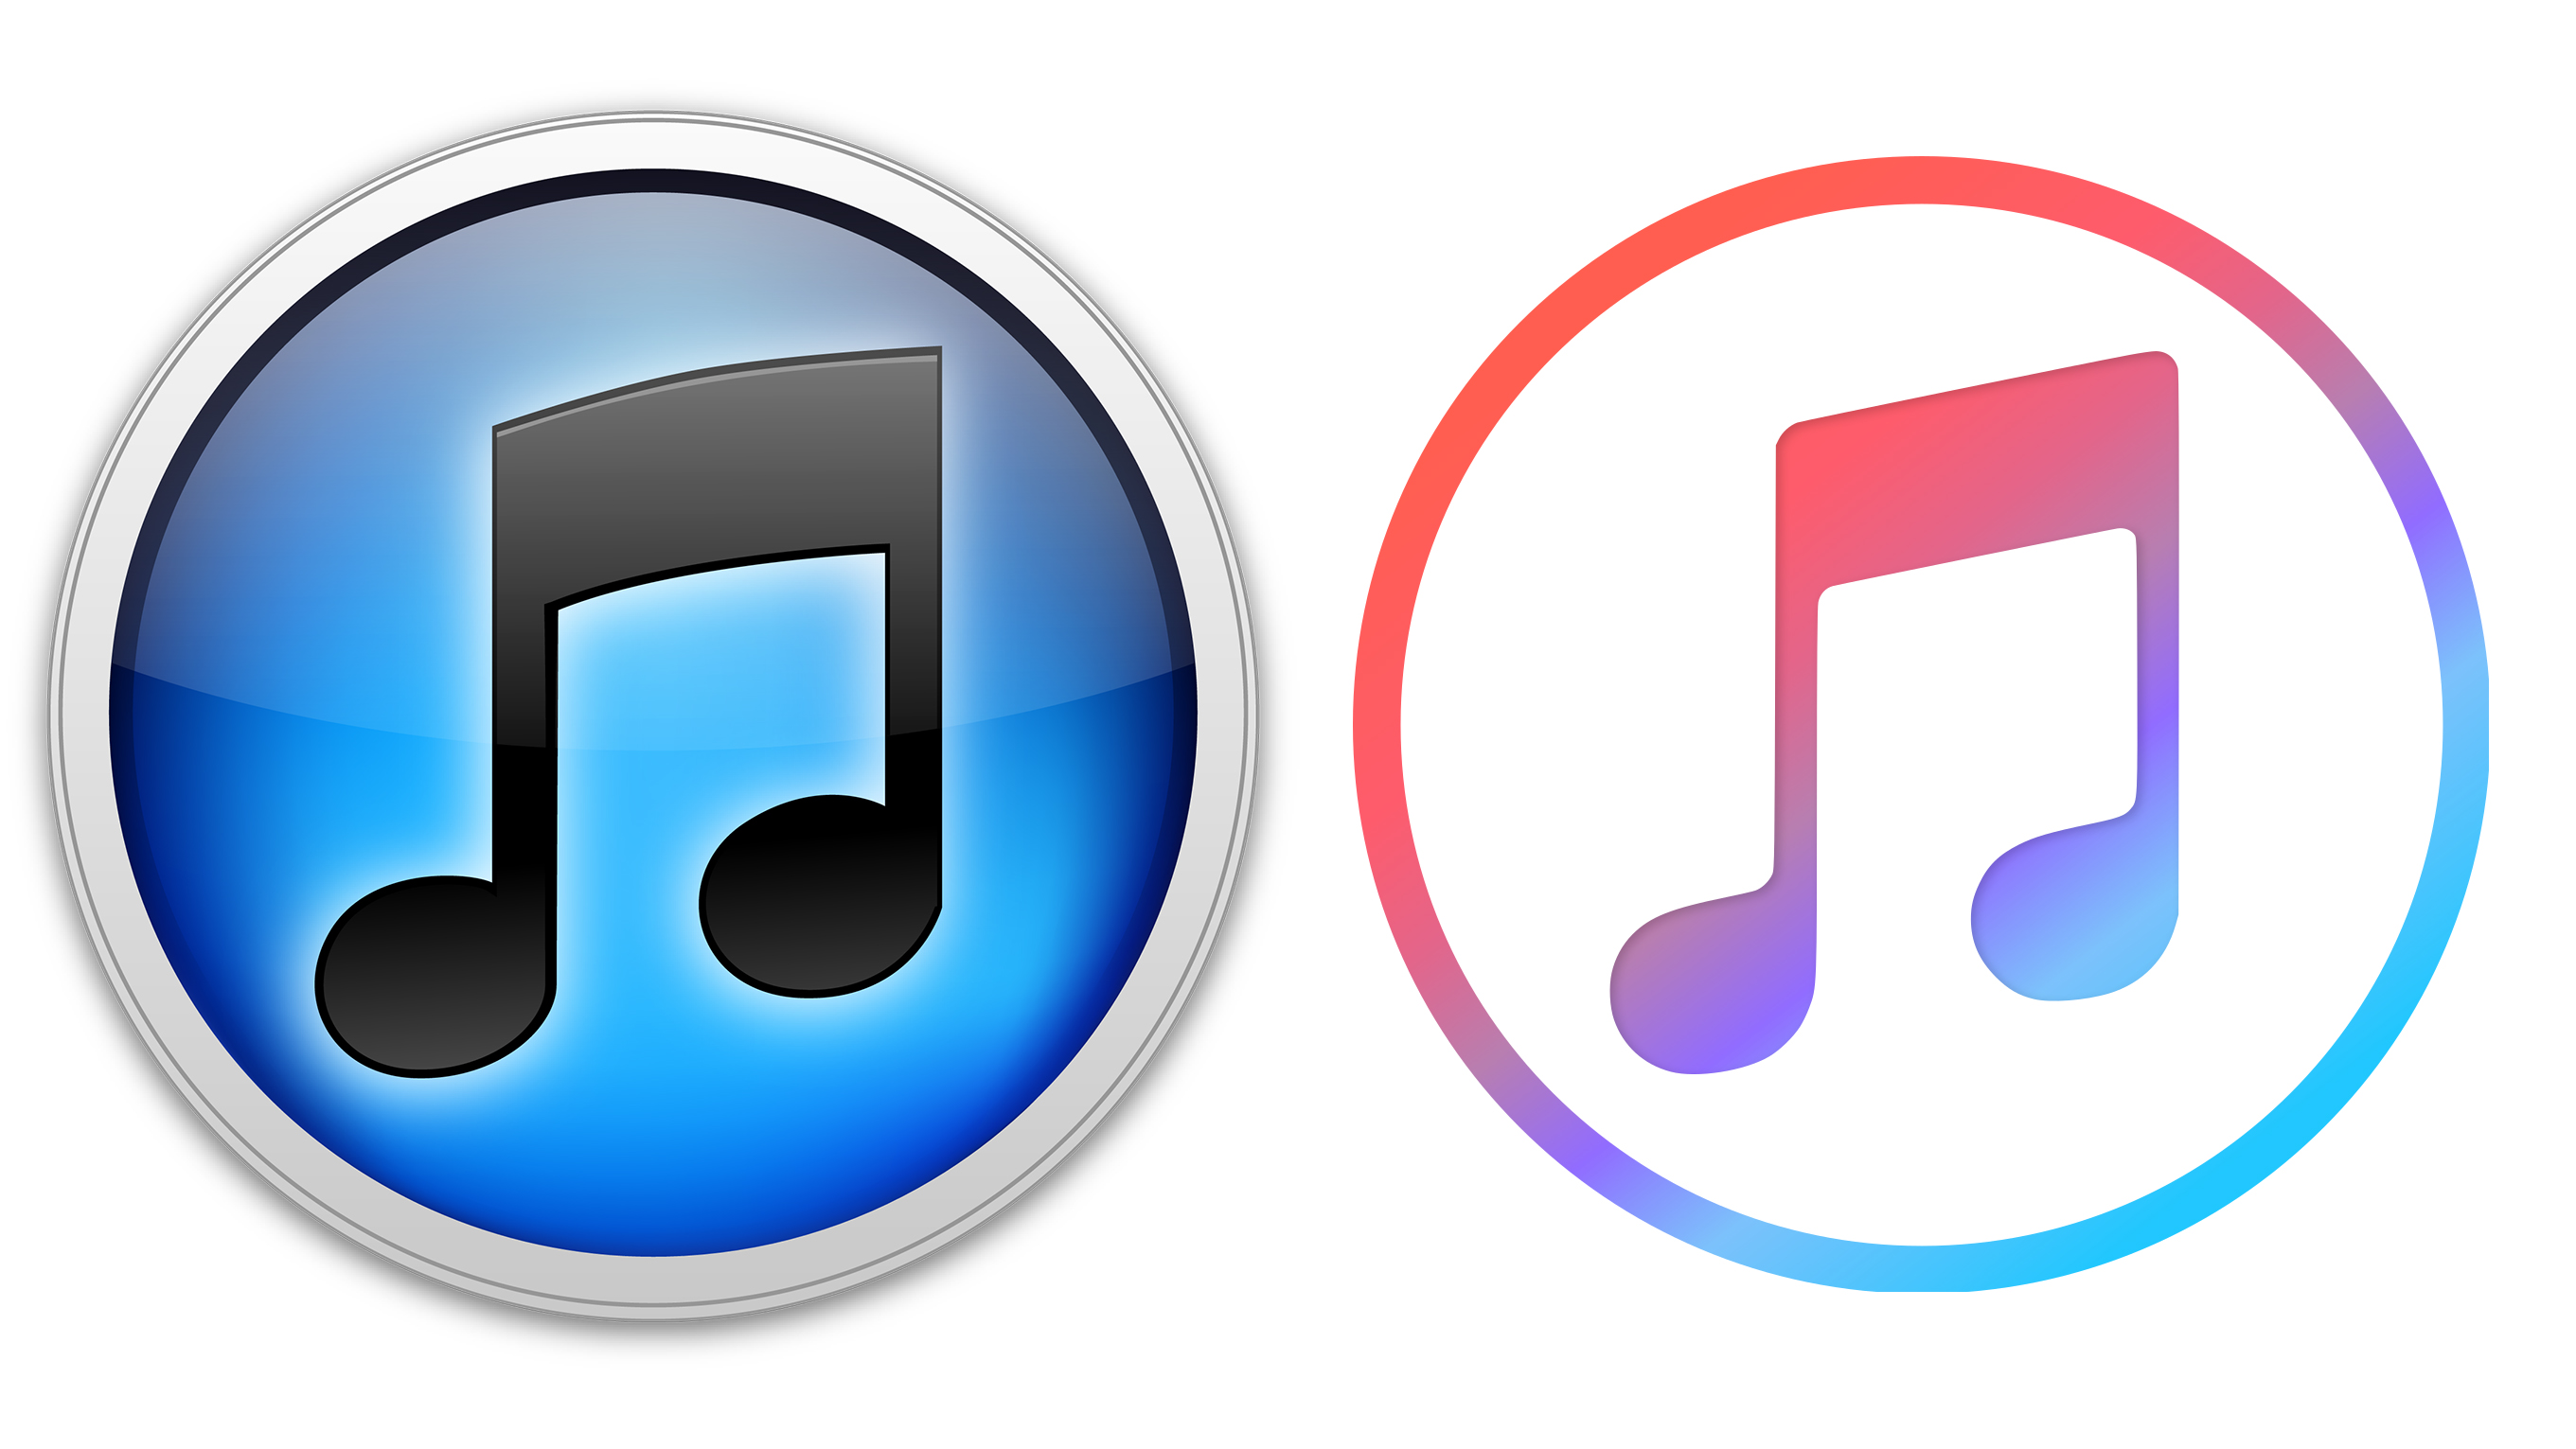 iTunes logo (2010 and present)